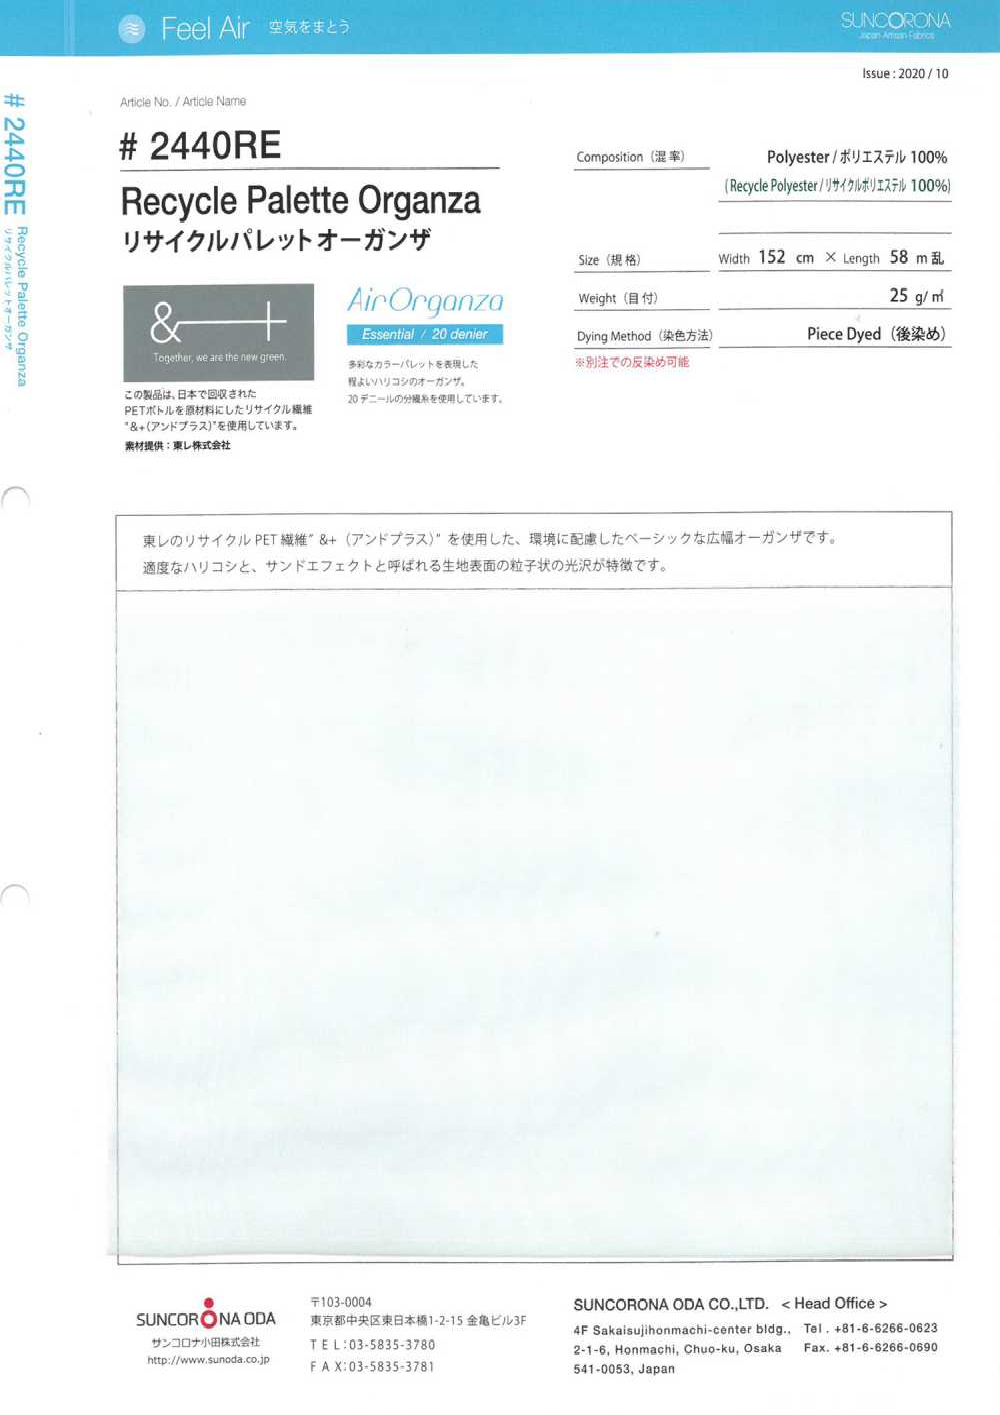 2440RE リサイクルパレットオーガンザ[生地] サンコロナ小田